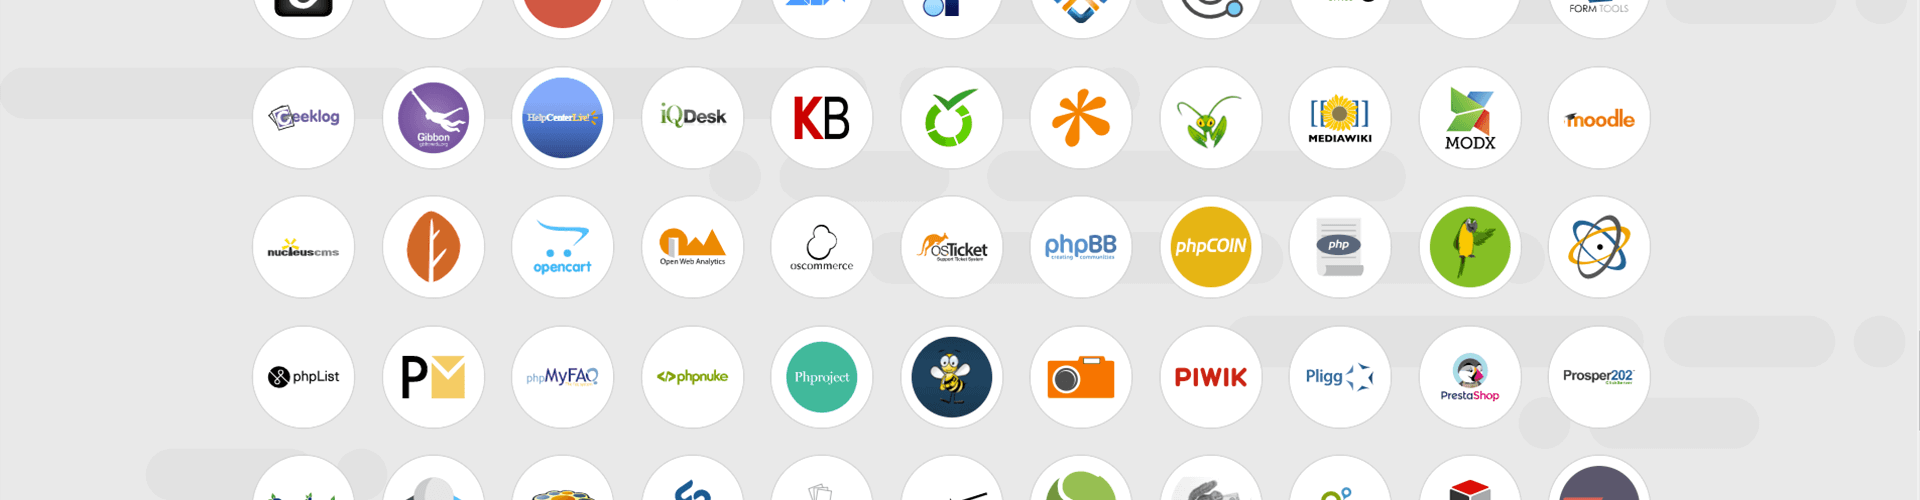 Our most popular free website apps - 20i com Blog